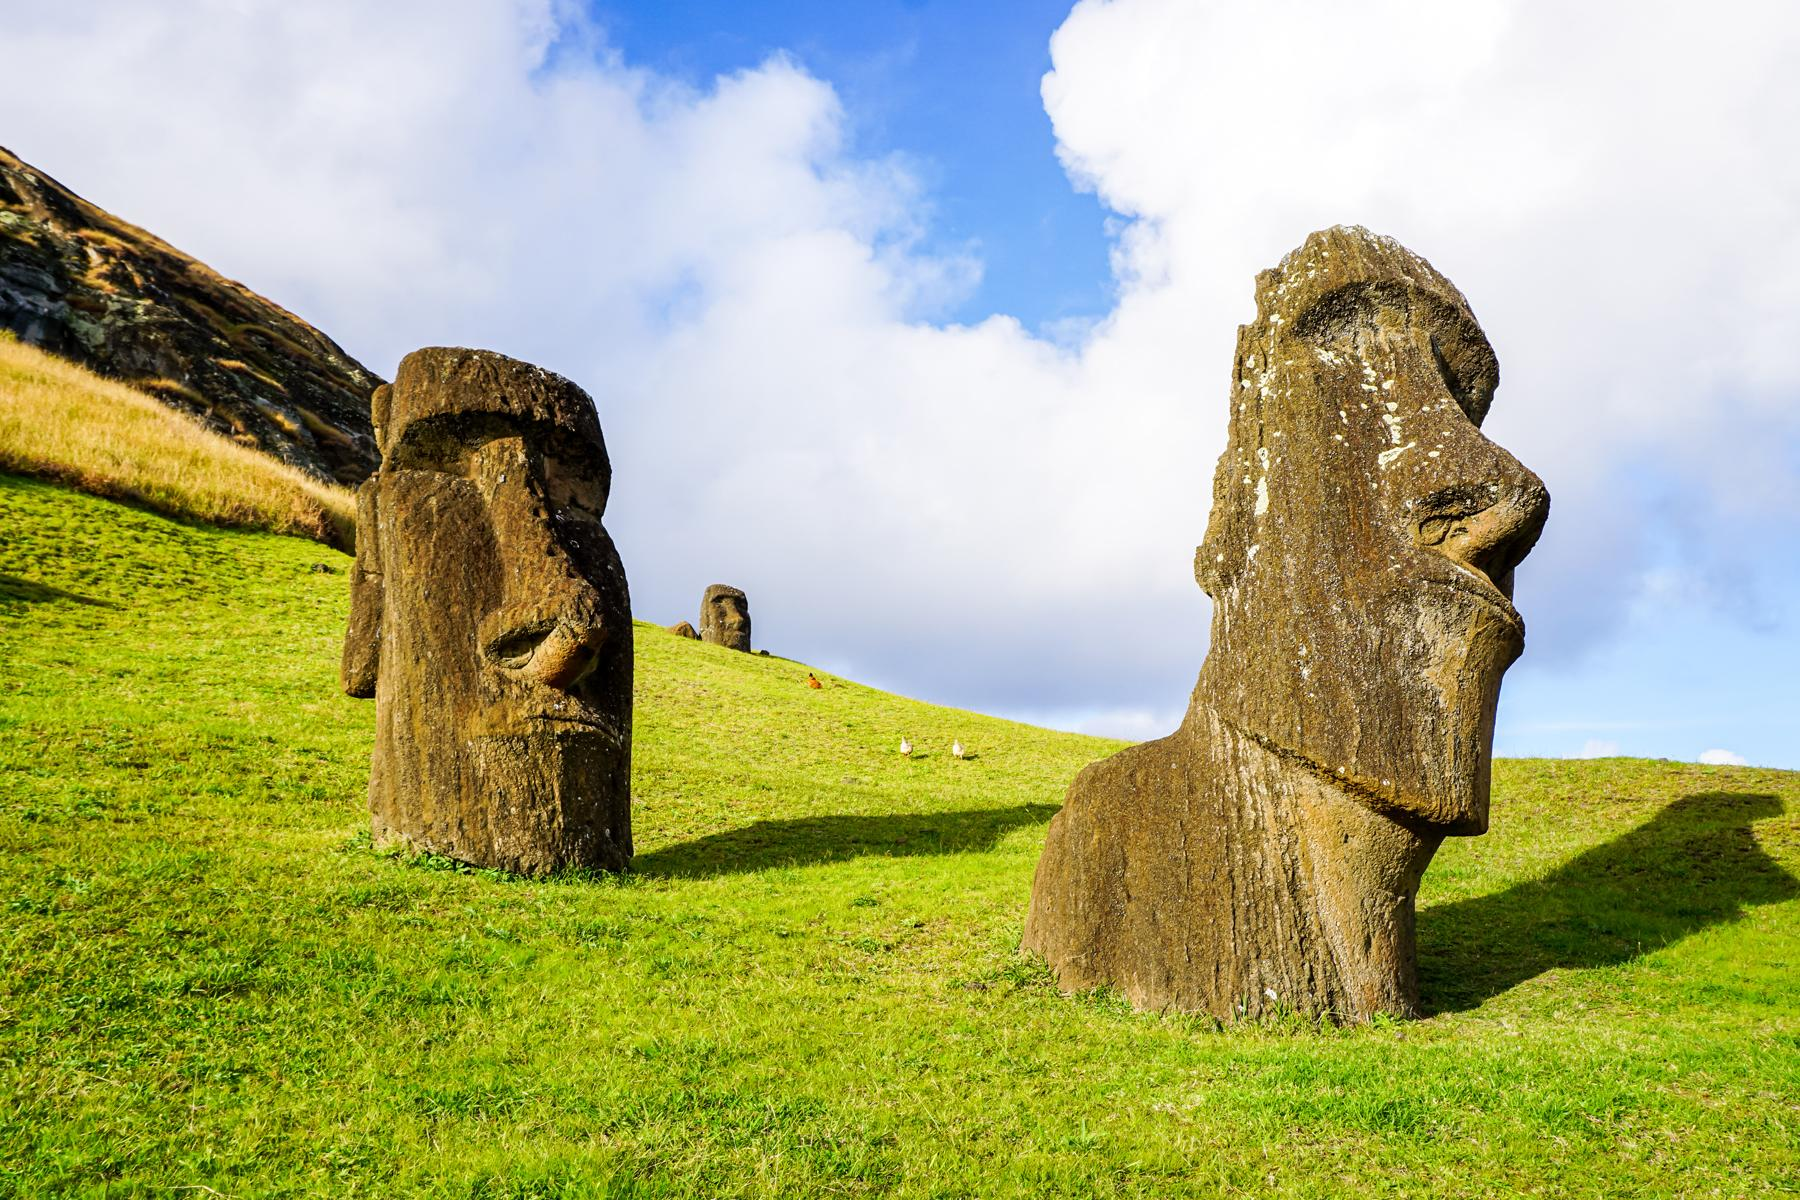 Easter-Island-LATAM-Eclipse-Flight_Moai-Rano-Raraku_1800x1200